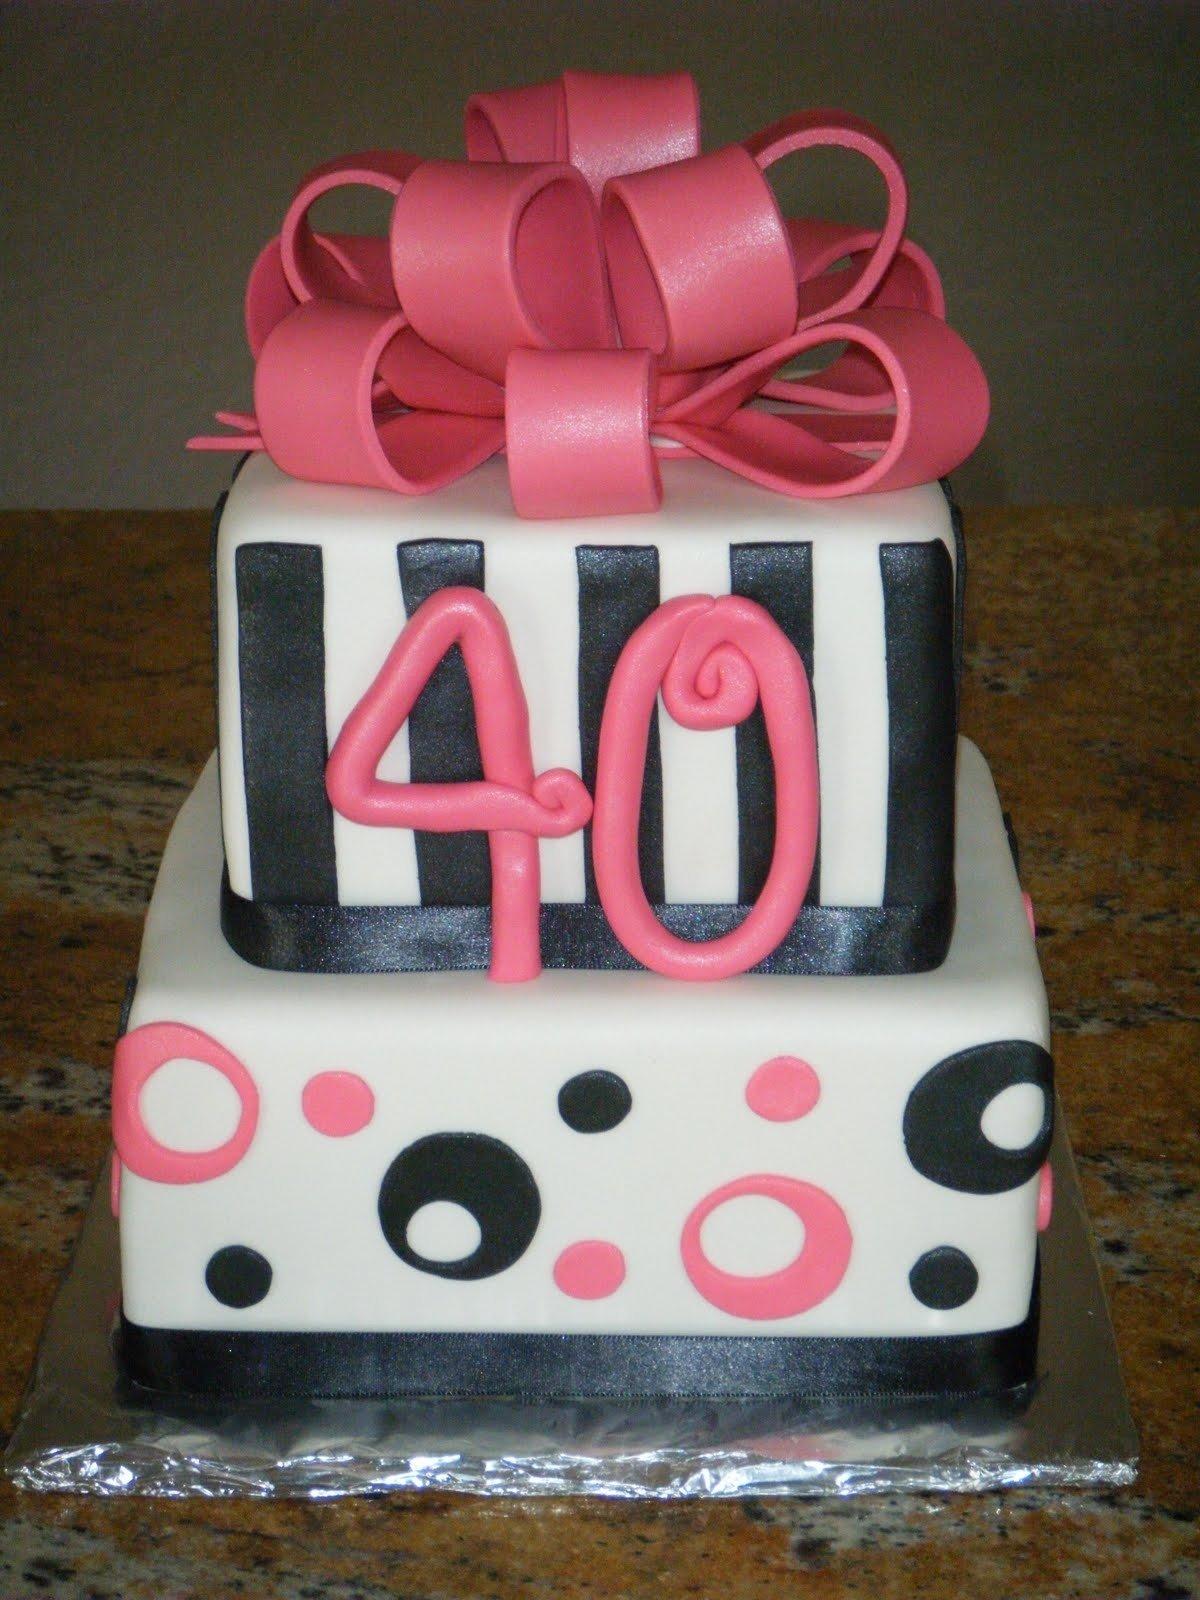 10 Stunning 40 Year Old Birthday Cake Ideas birthday cakes images astonishing 40th birthday cake 40th birthday